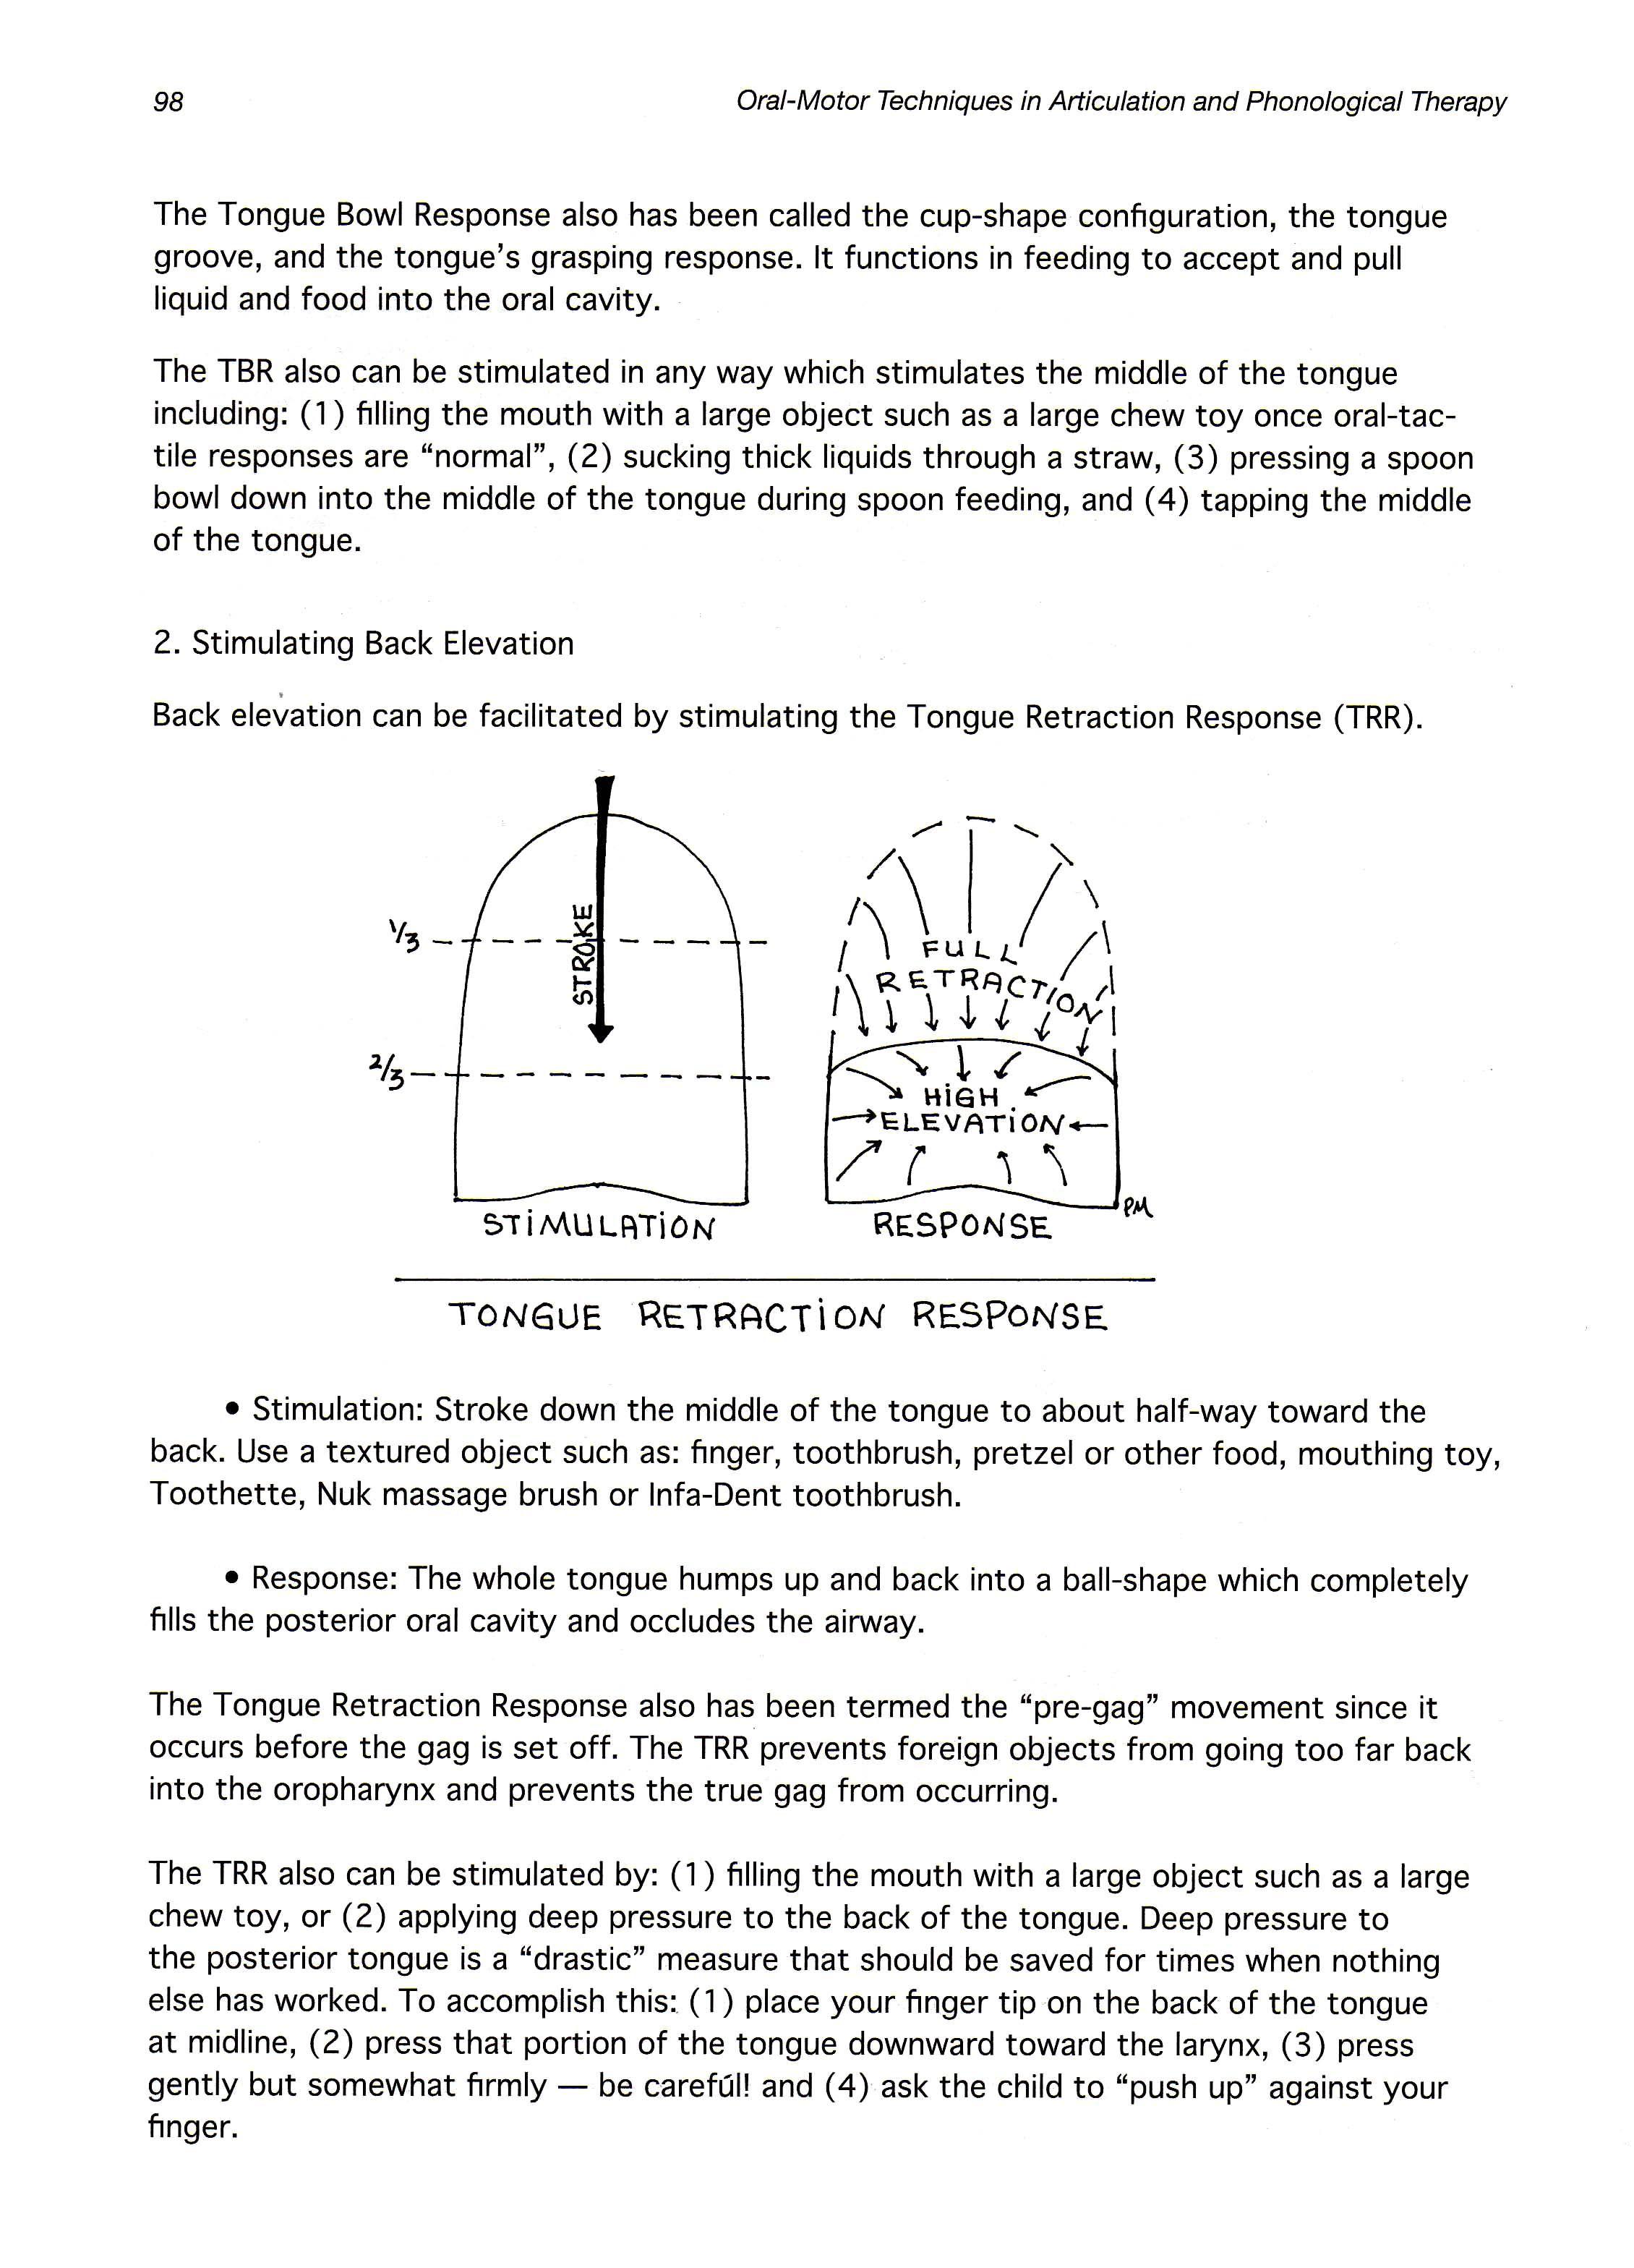 Tongue Bowl Response - Stimulating Tongue Back Elevation for speech ...